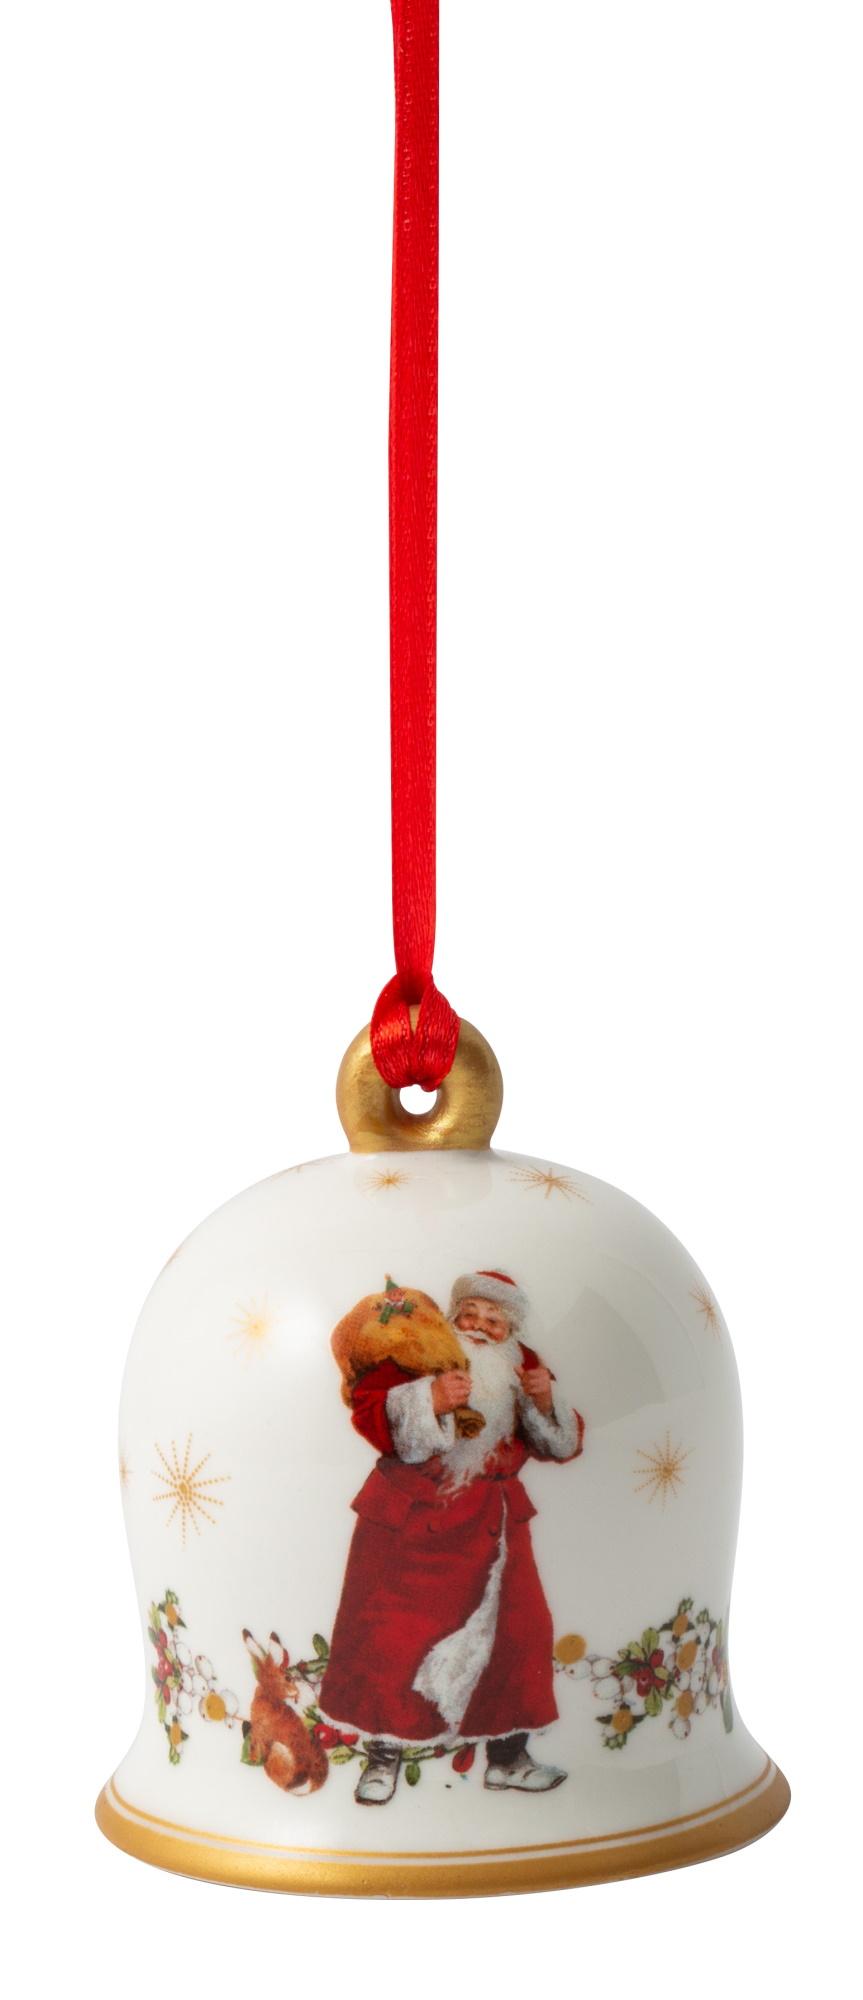 Decoratiune Villeroy & Boch Annual Christmas Edition Bell 2020 6x6cm poza